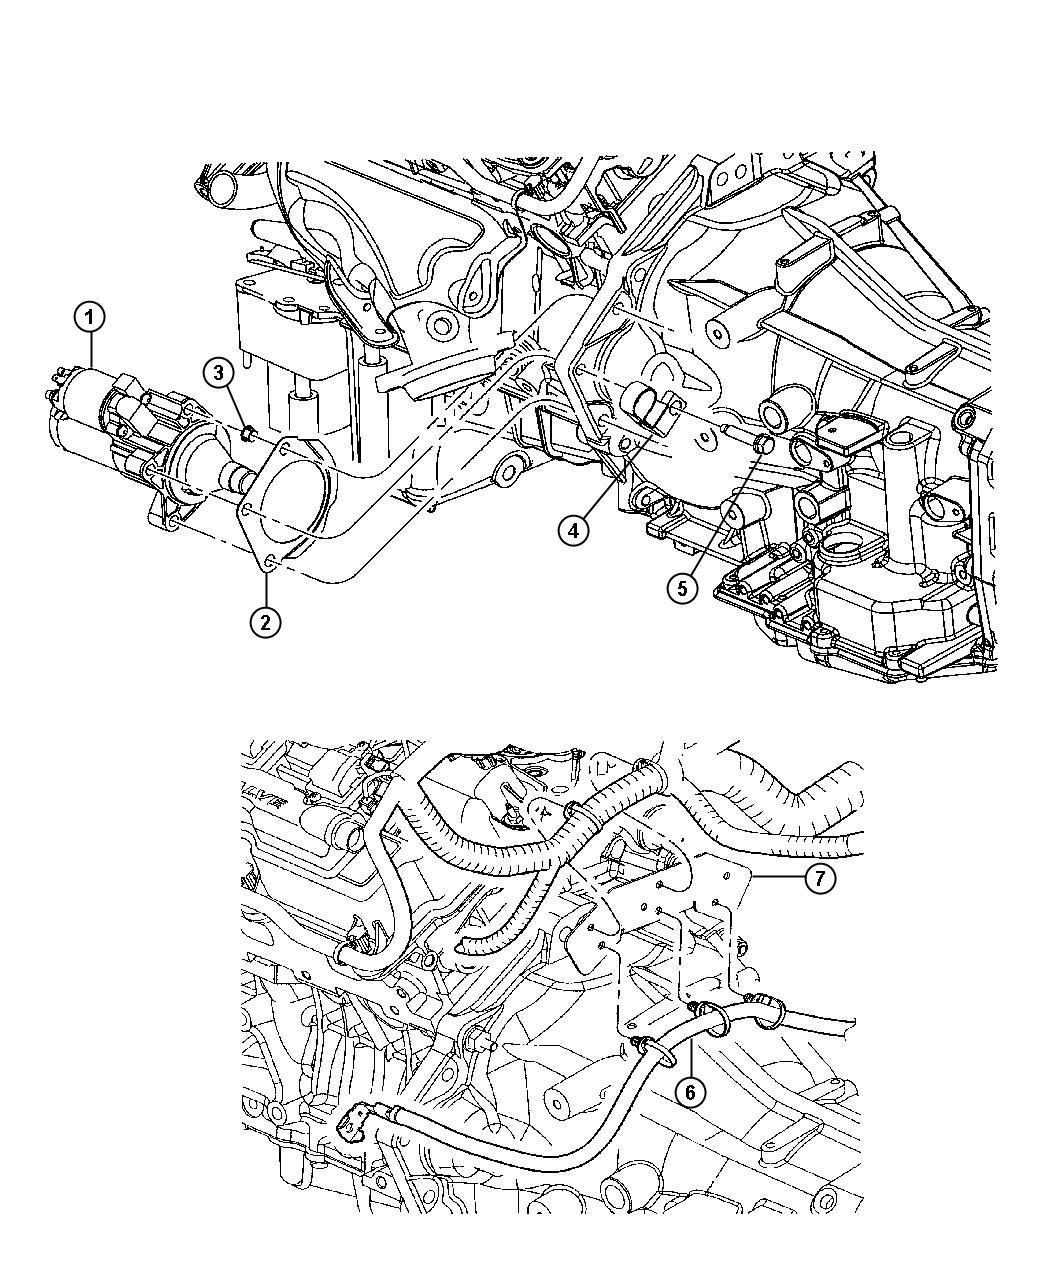 Dodge Intrepid Shield Starter